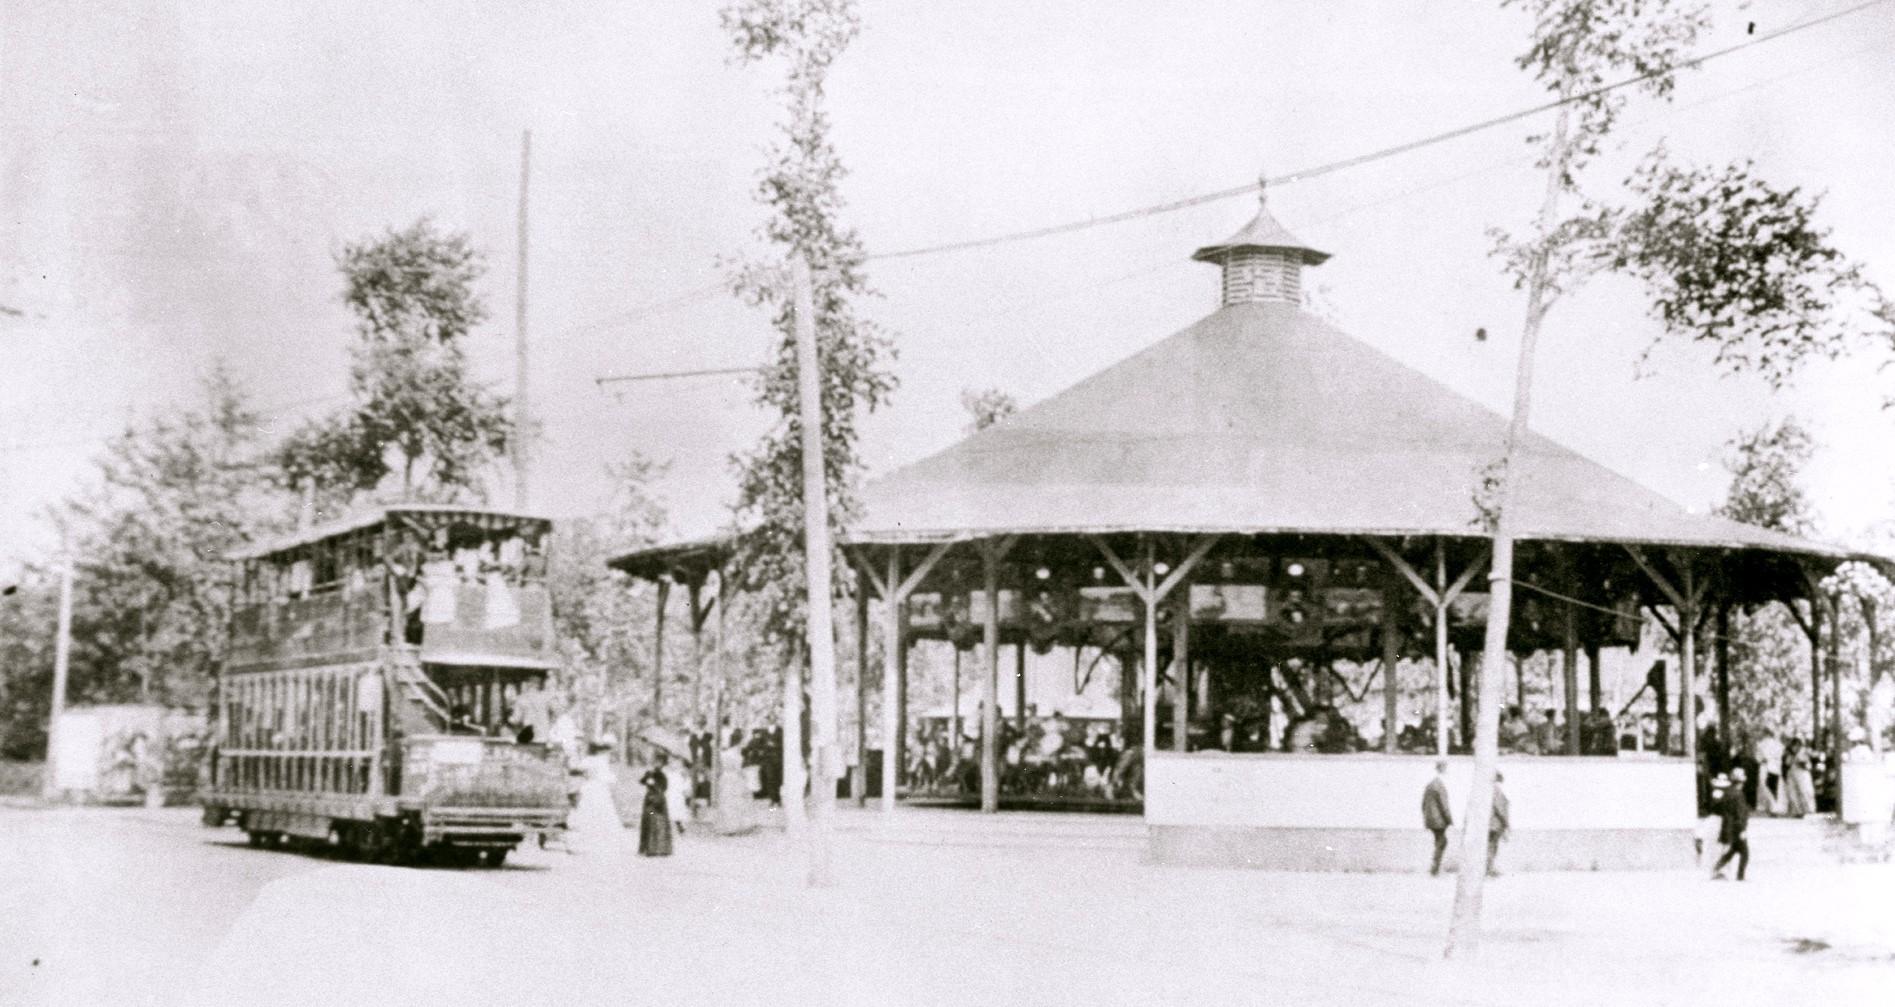 Carousel-Streetcar